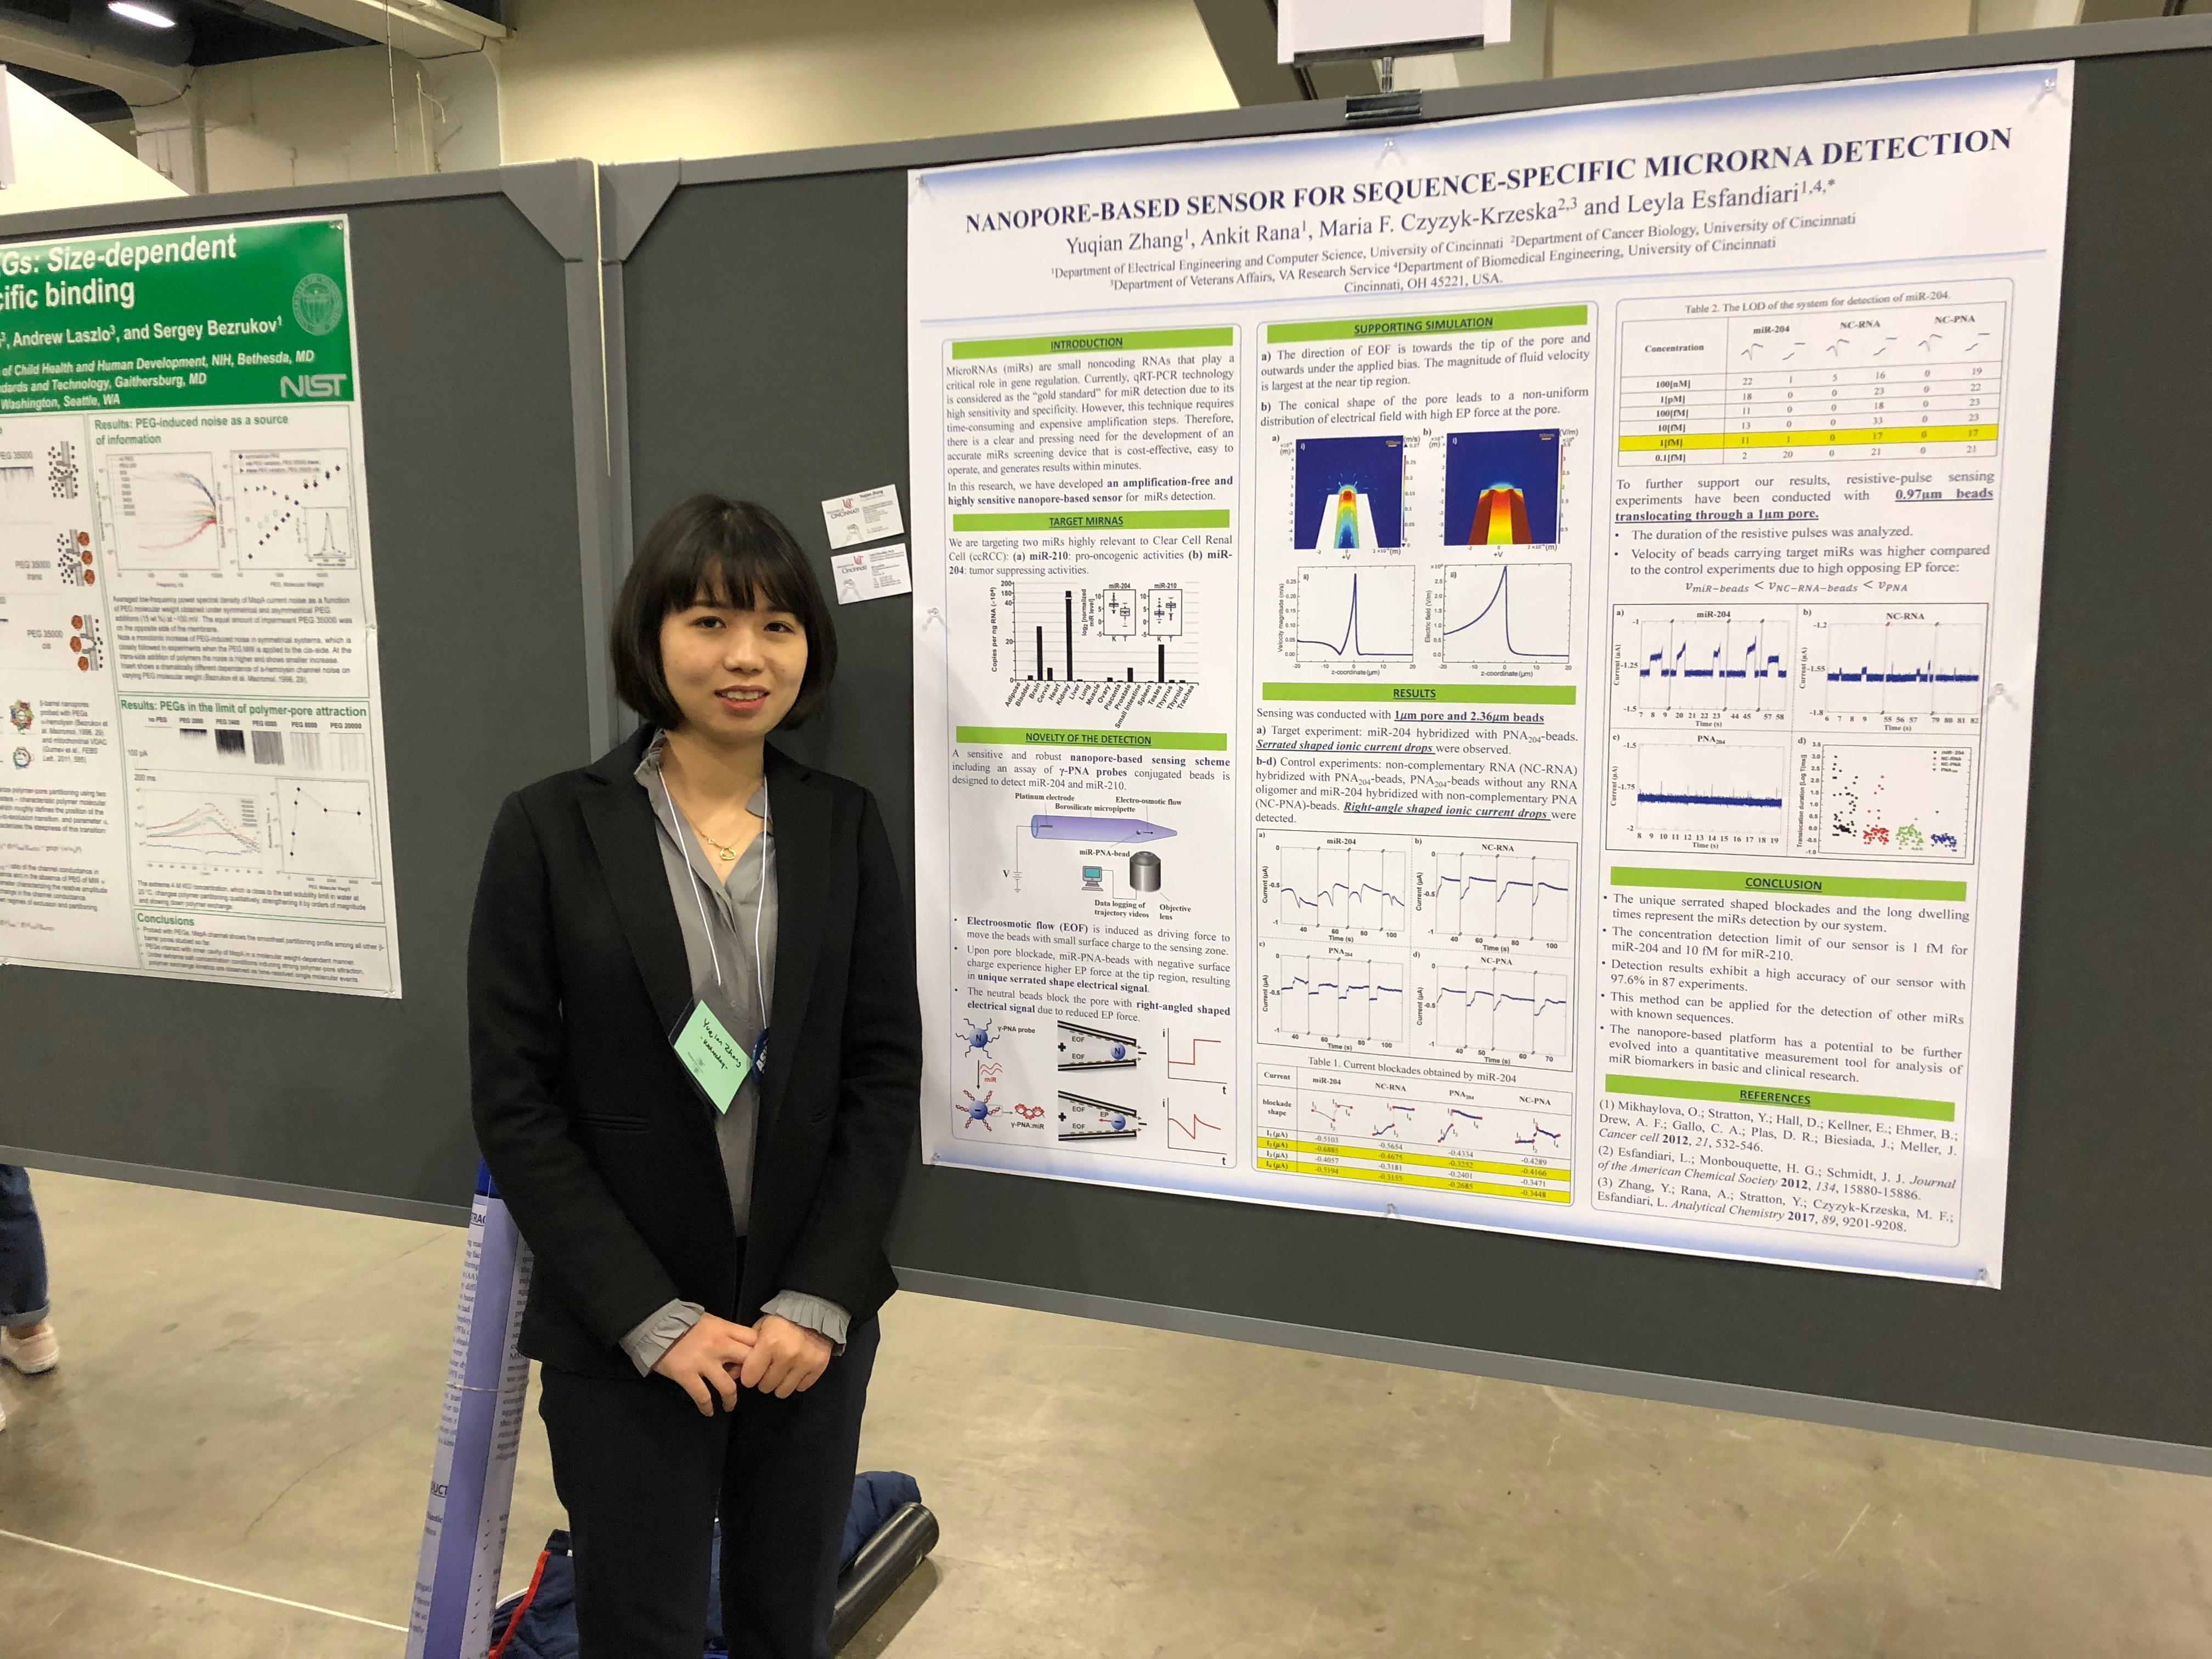 Yuqian presenting at Biophysical Society meeting